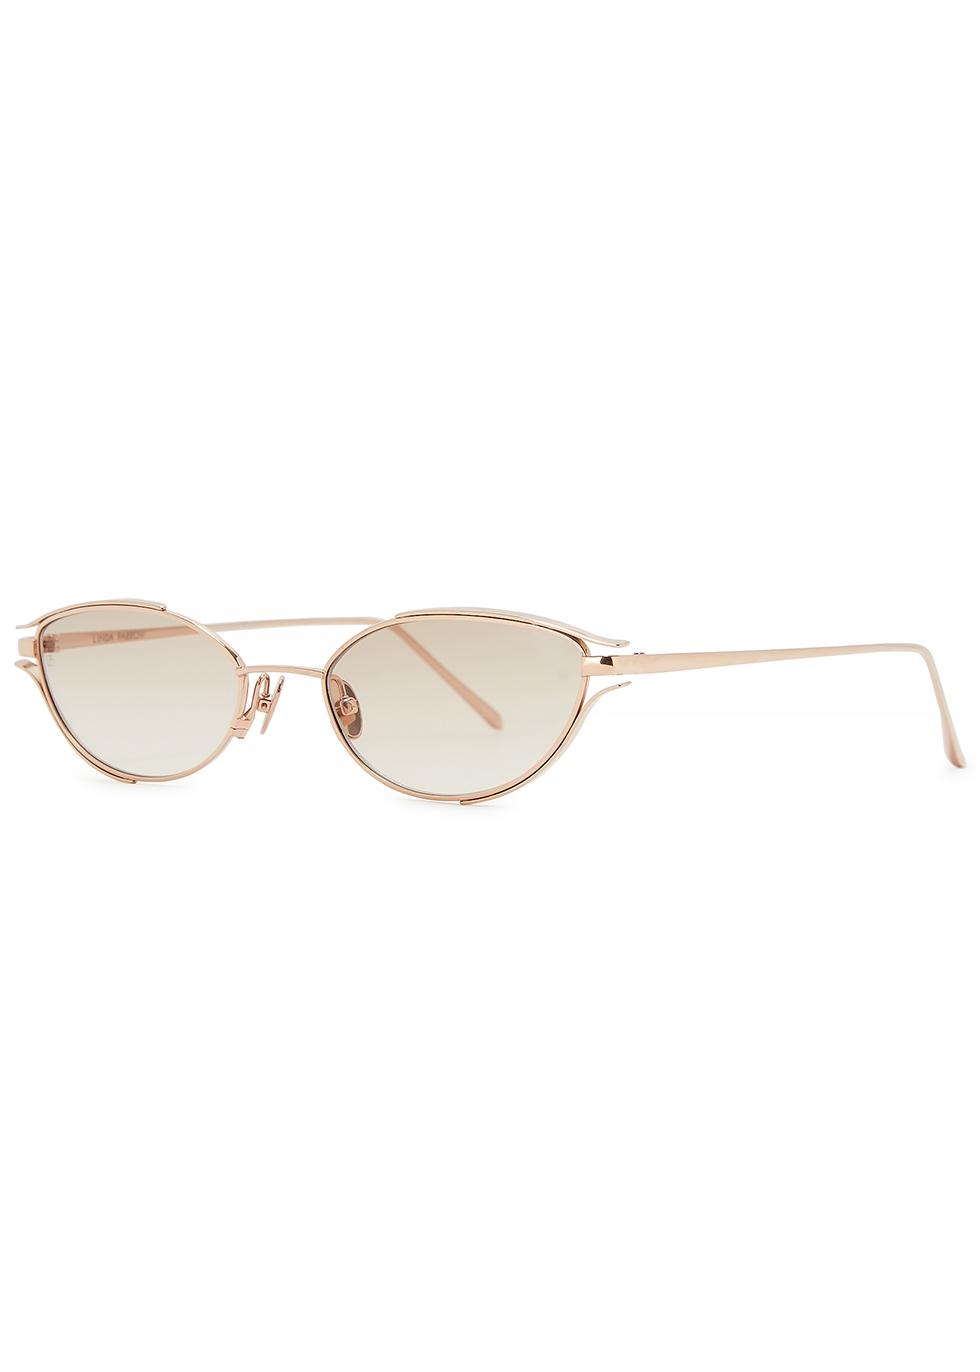 Violet C4 rose gold-tone cat-eye sunglasses